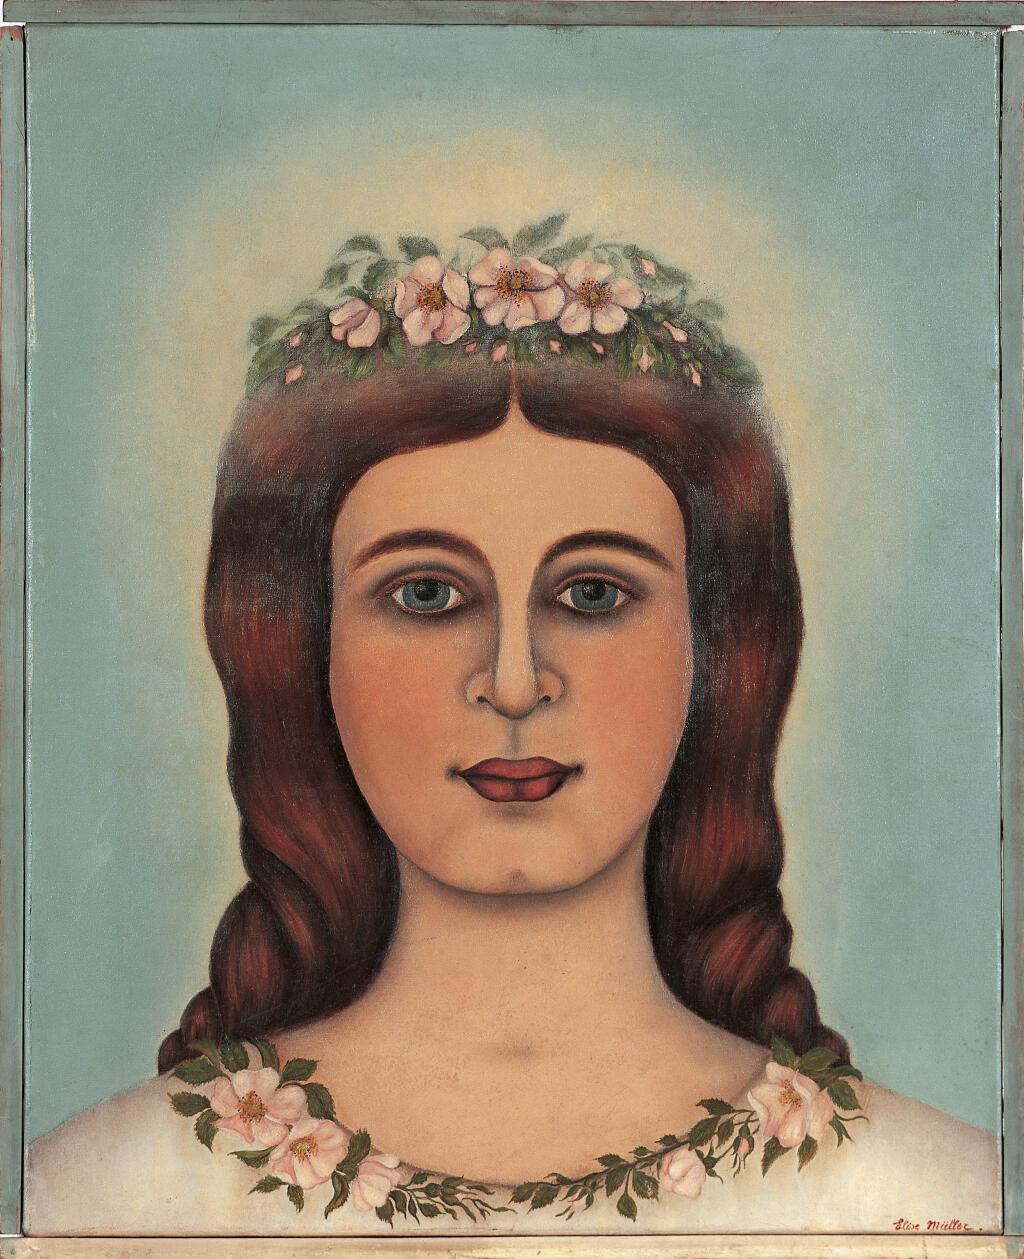 Élise Müller, A Filha de Jairus, 3 de agosto-15 de setembro de 1913, óleo sobre tela e madeira, 51,6 × 42 cm, LaM,